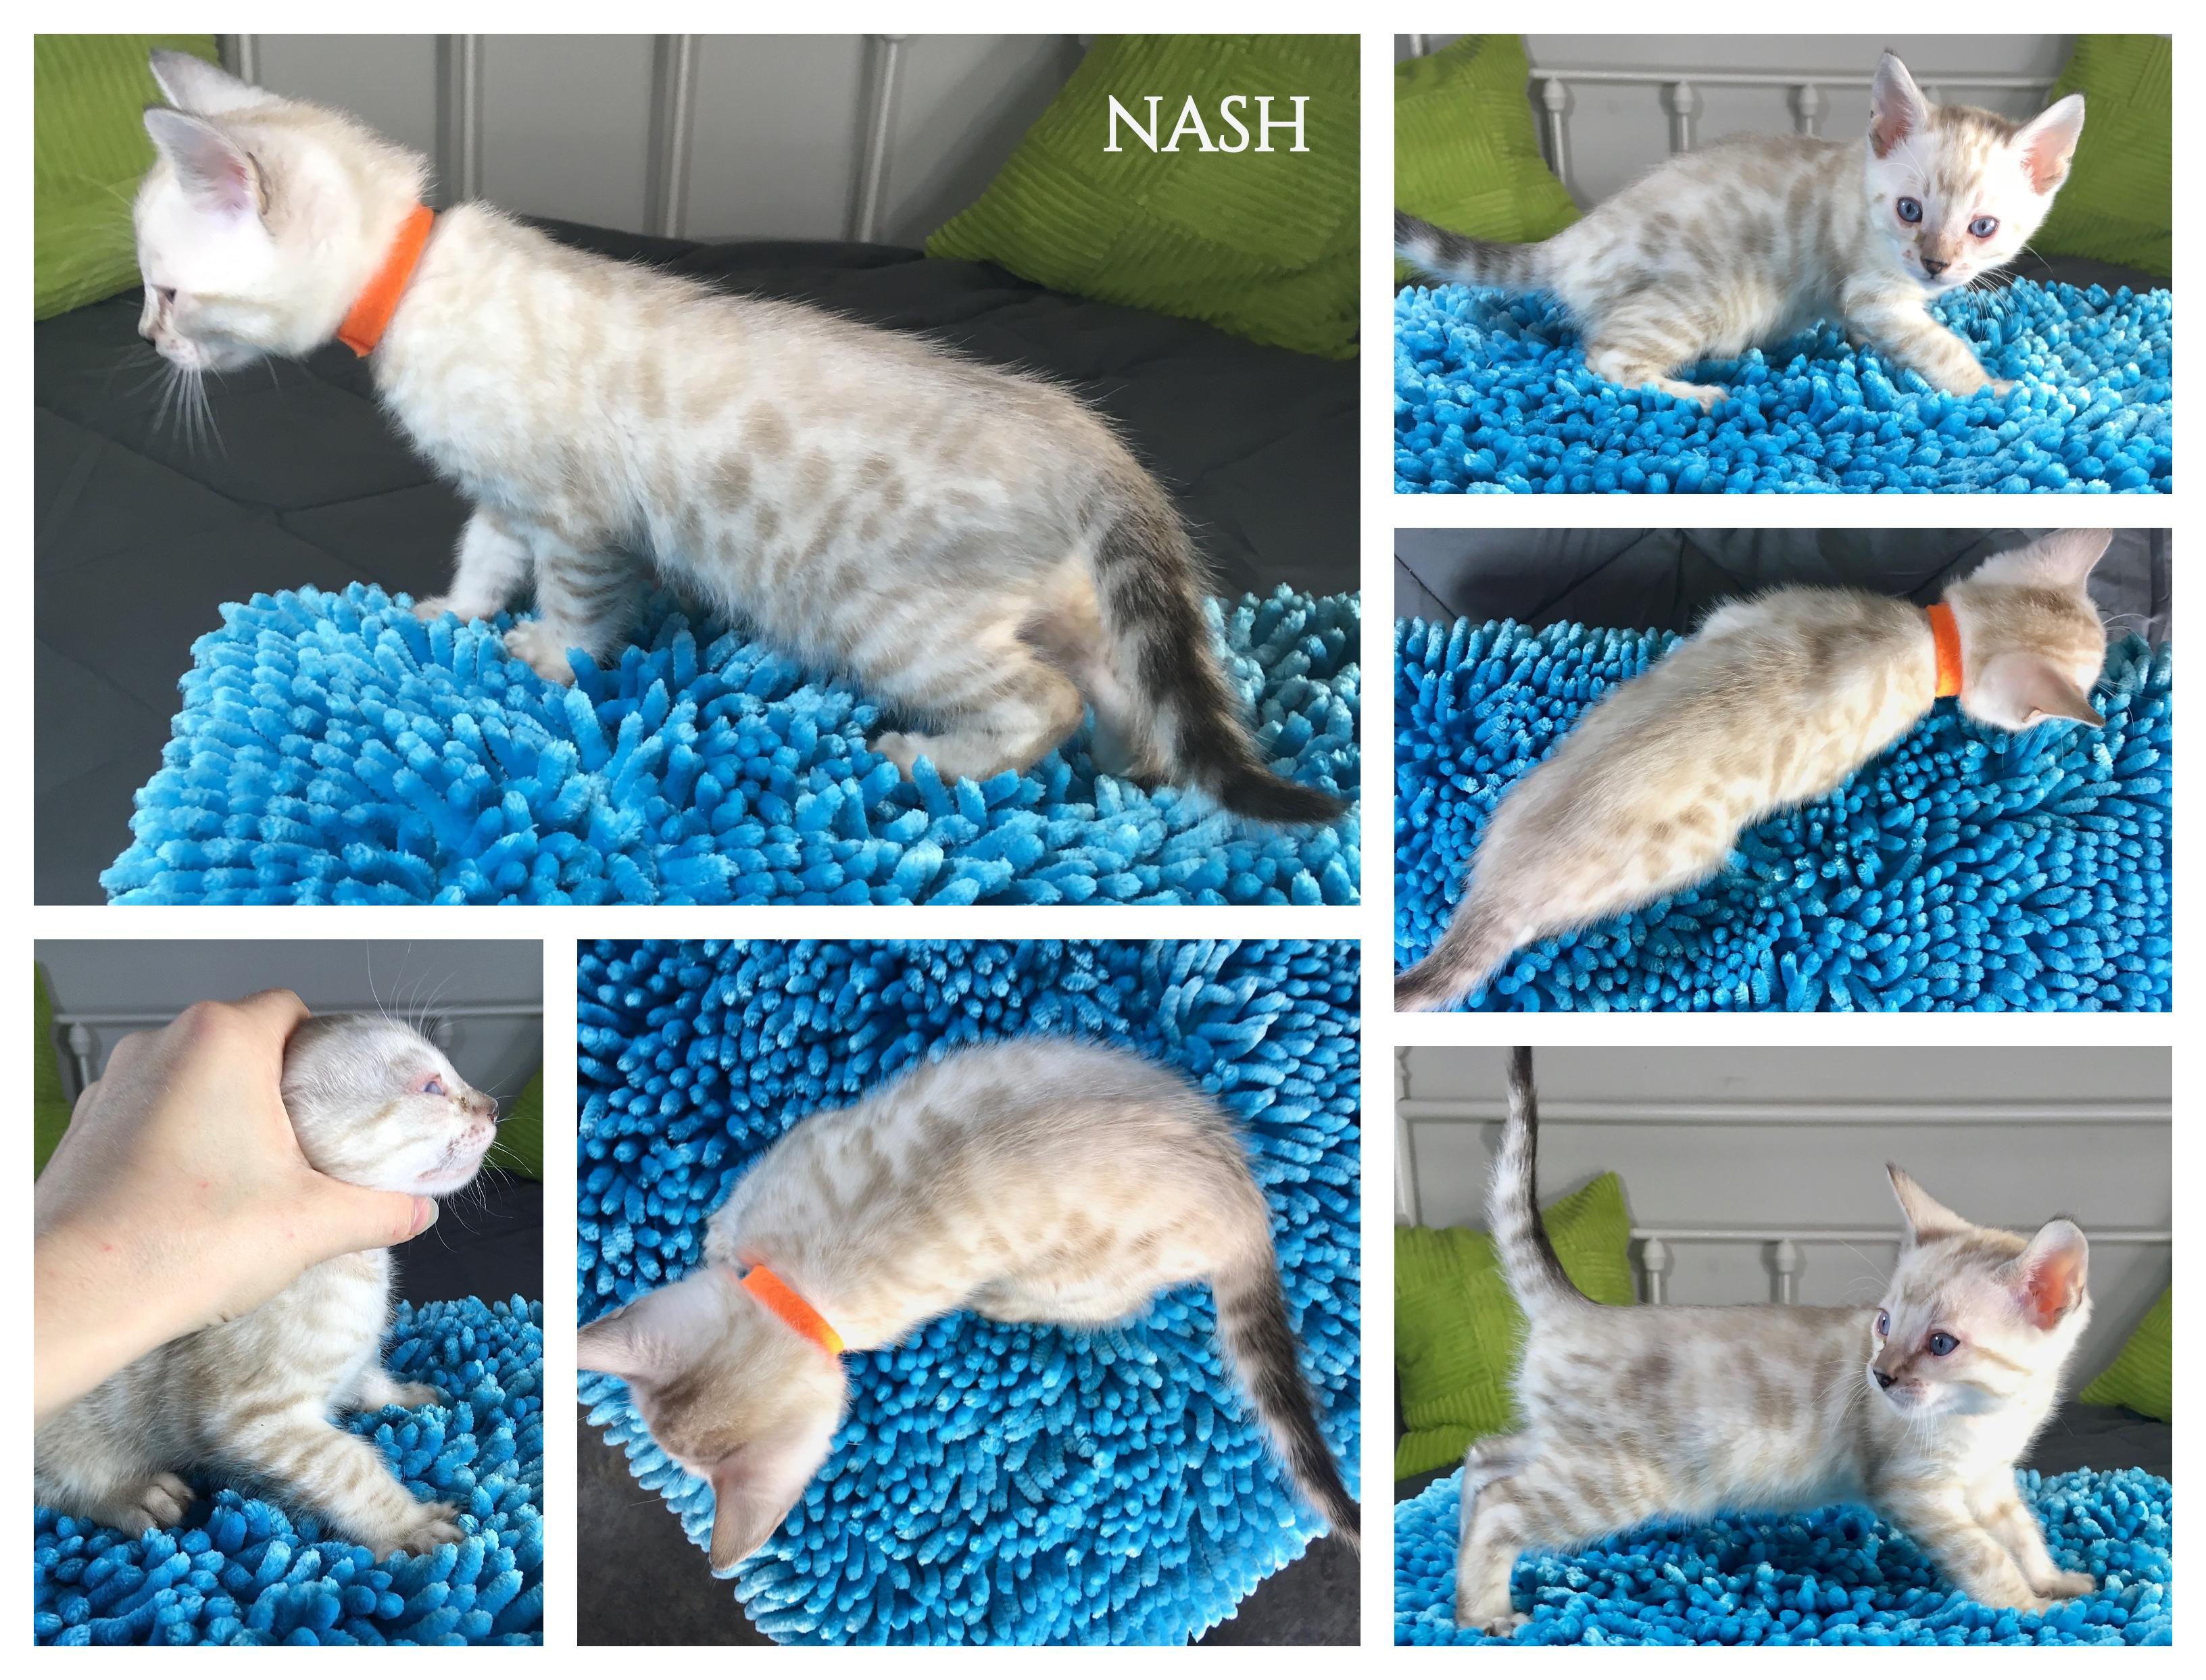 Nash 6 weeks